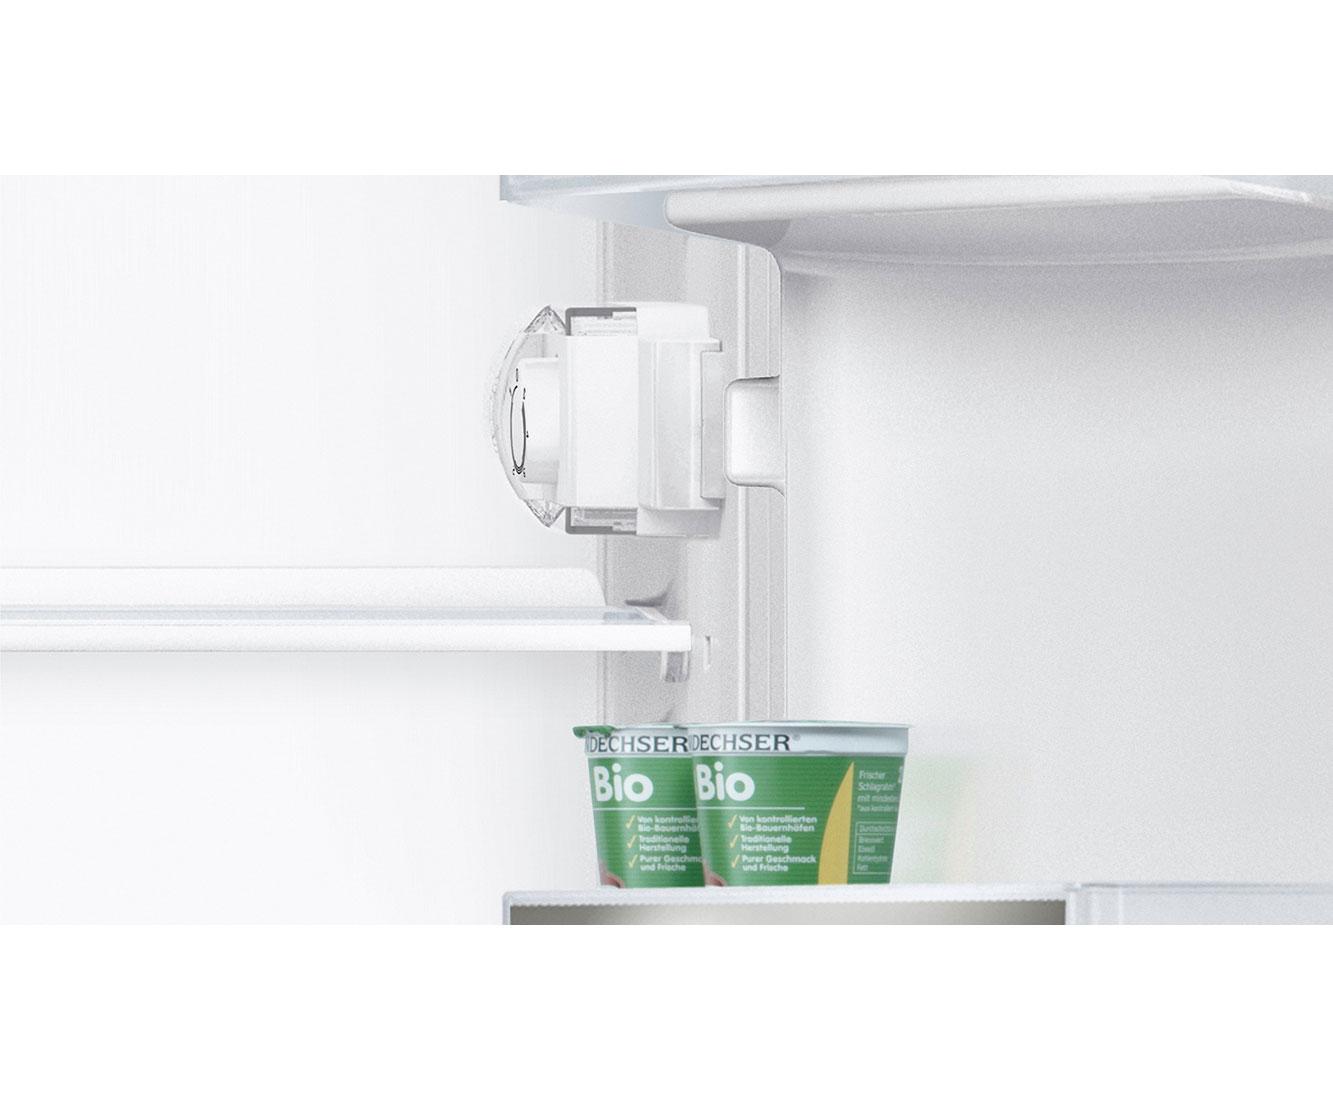 Siemens Retro Kühlschrank : Siemens ki rv kühlschrank iq eingebaut cm weiß neu ebay